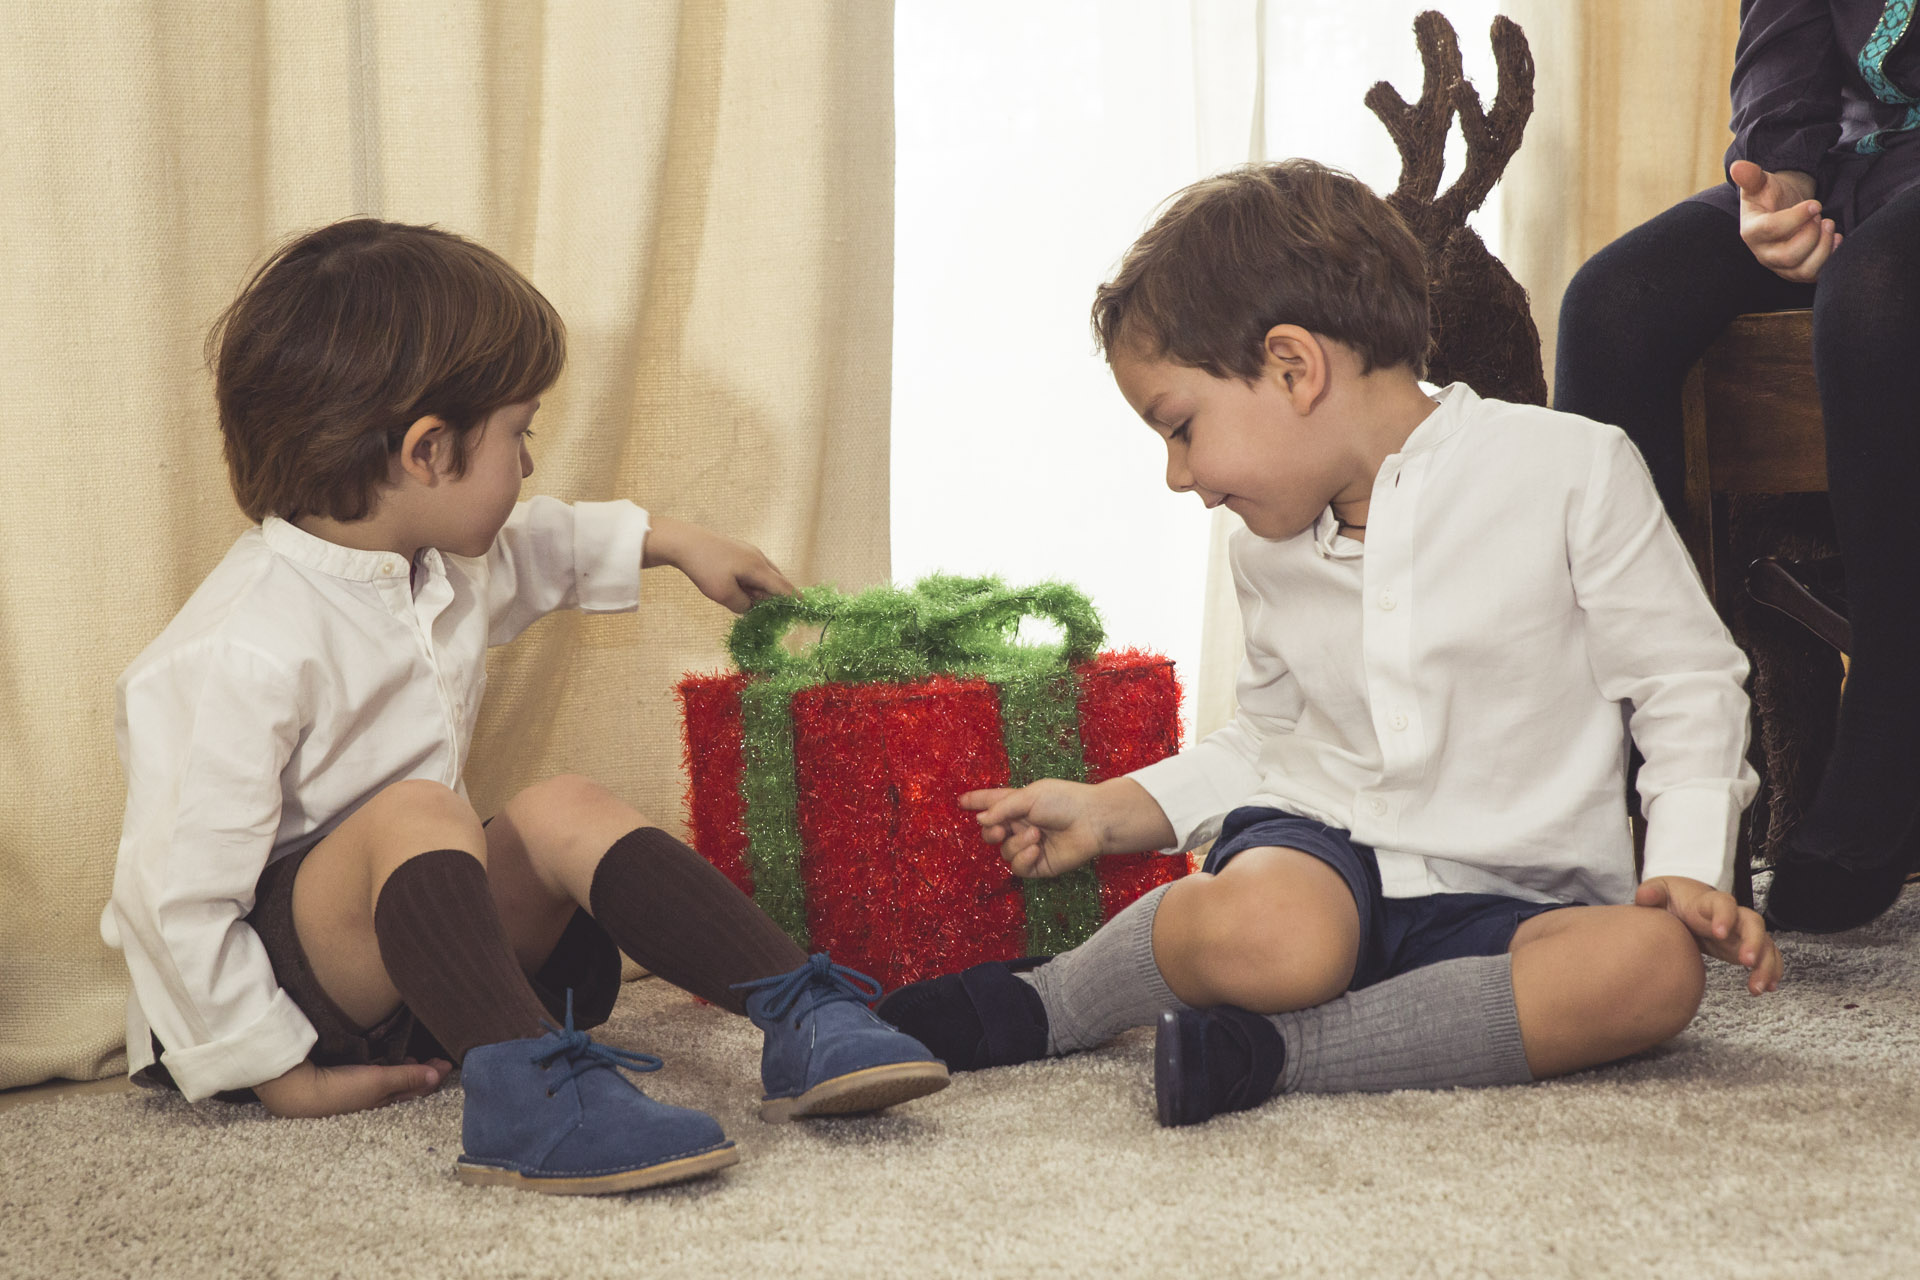 Garçons chics pour Noël avec Pisamonas